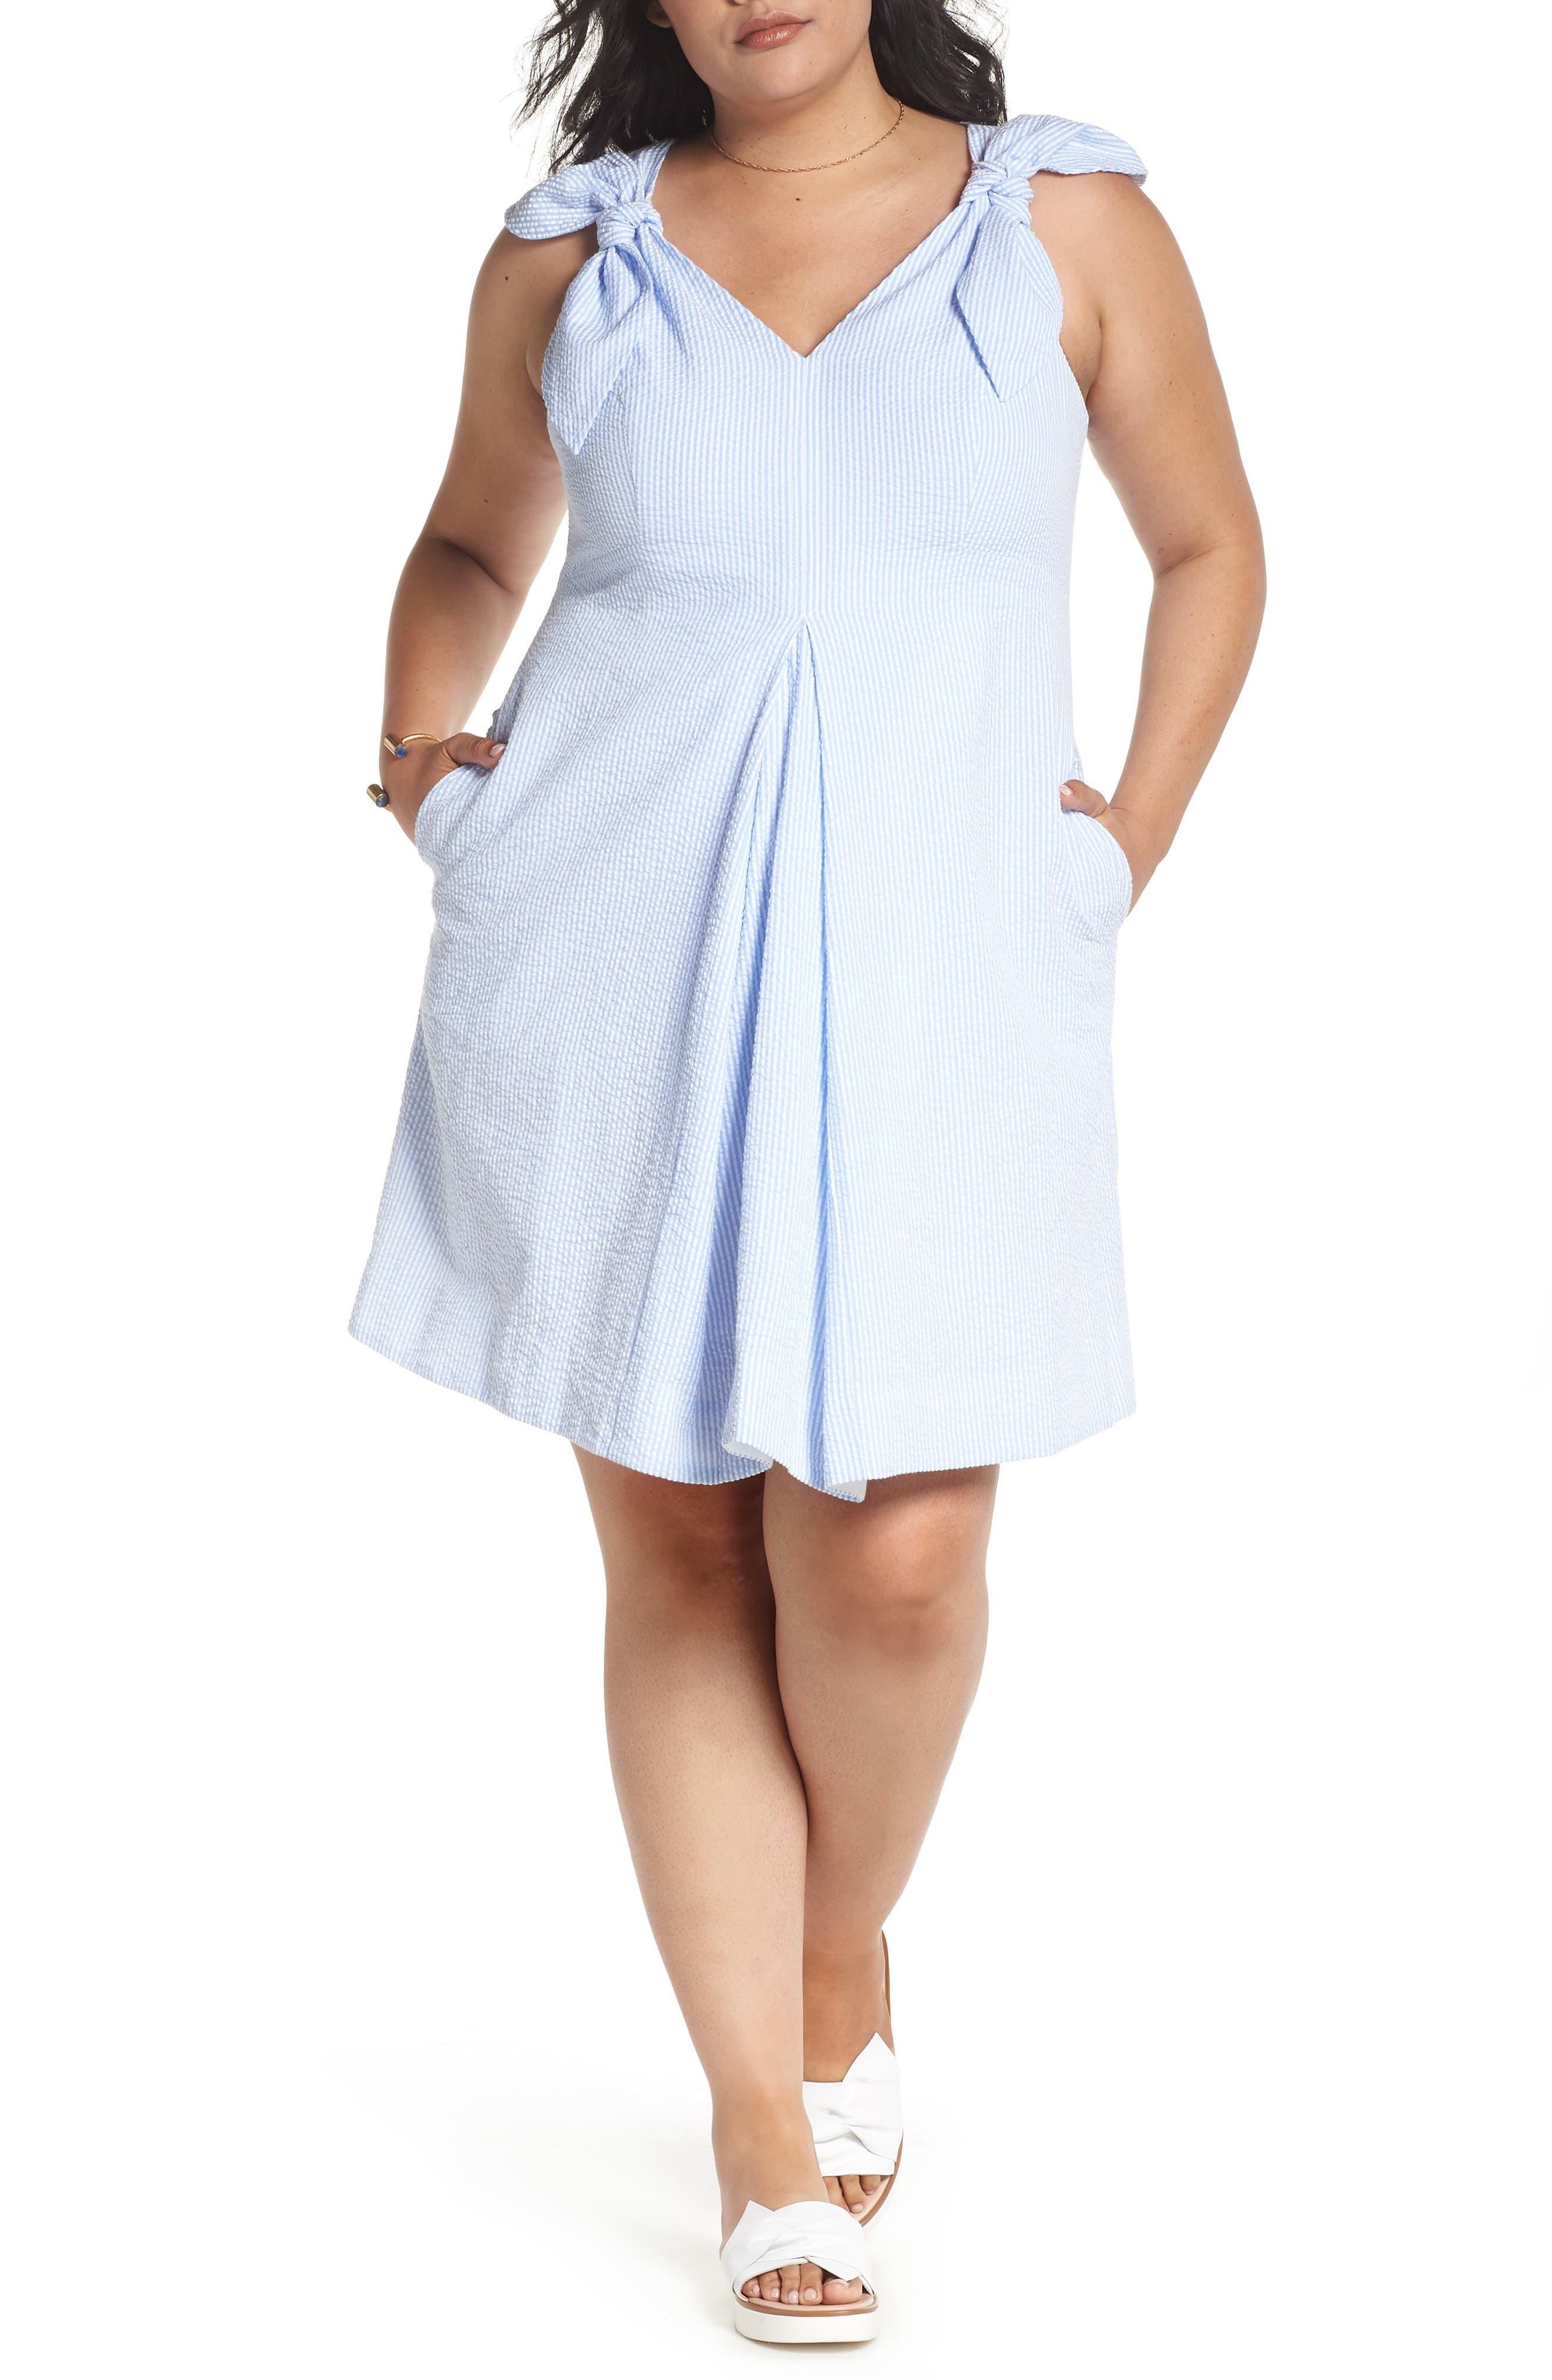 Bow Shoulder Seersucker Dress,                             Main thumbnail 1, color,                             Blue Seersucker Stripe